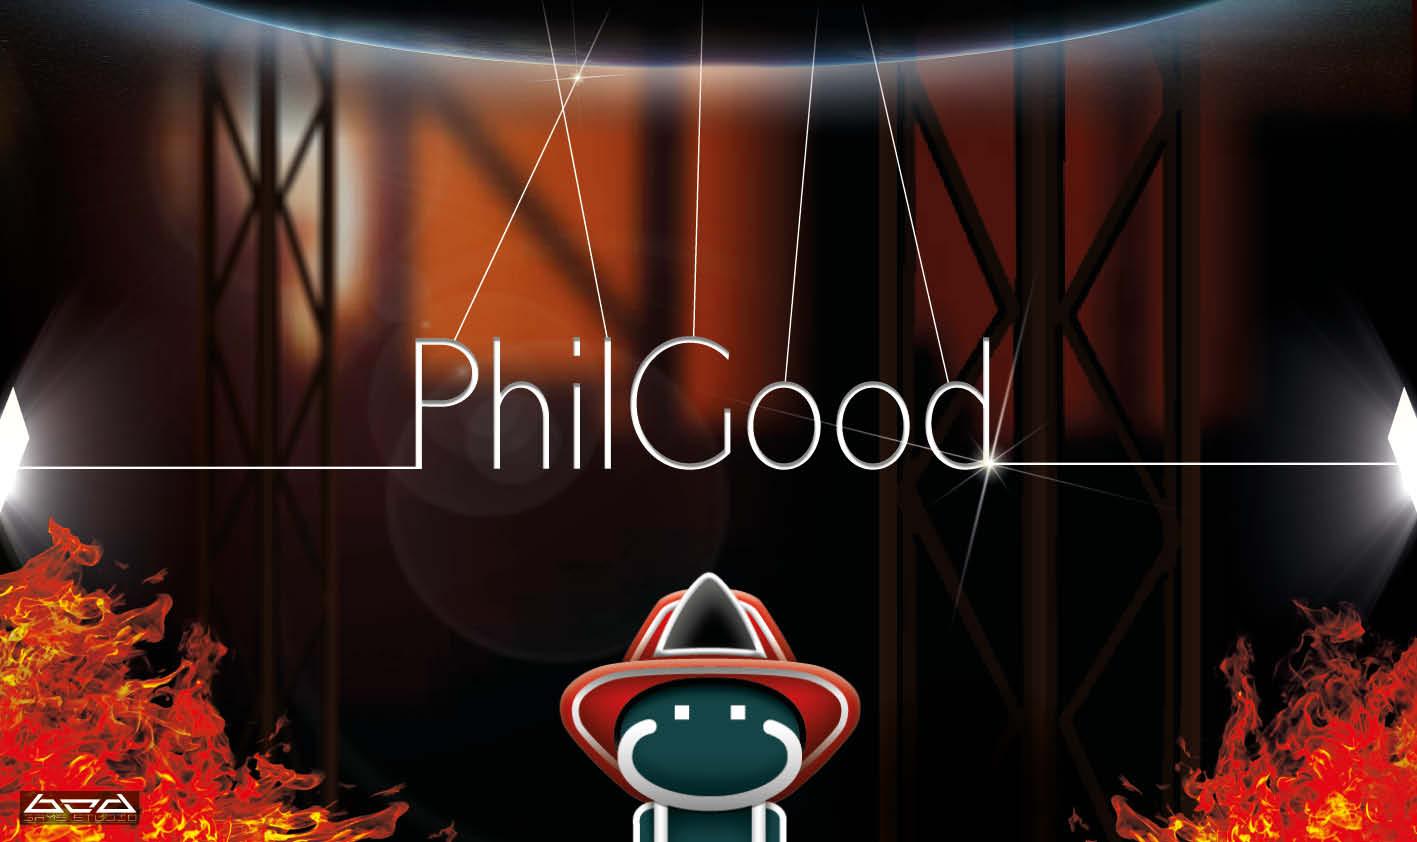 Philgood Poster landscape - 1417x842pxl